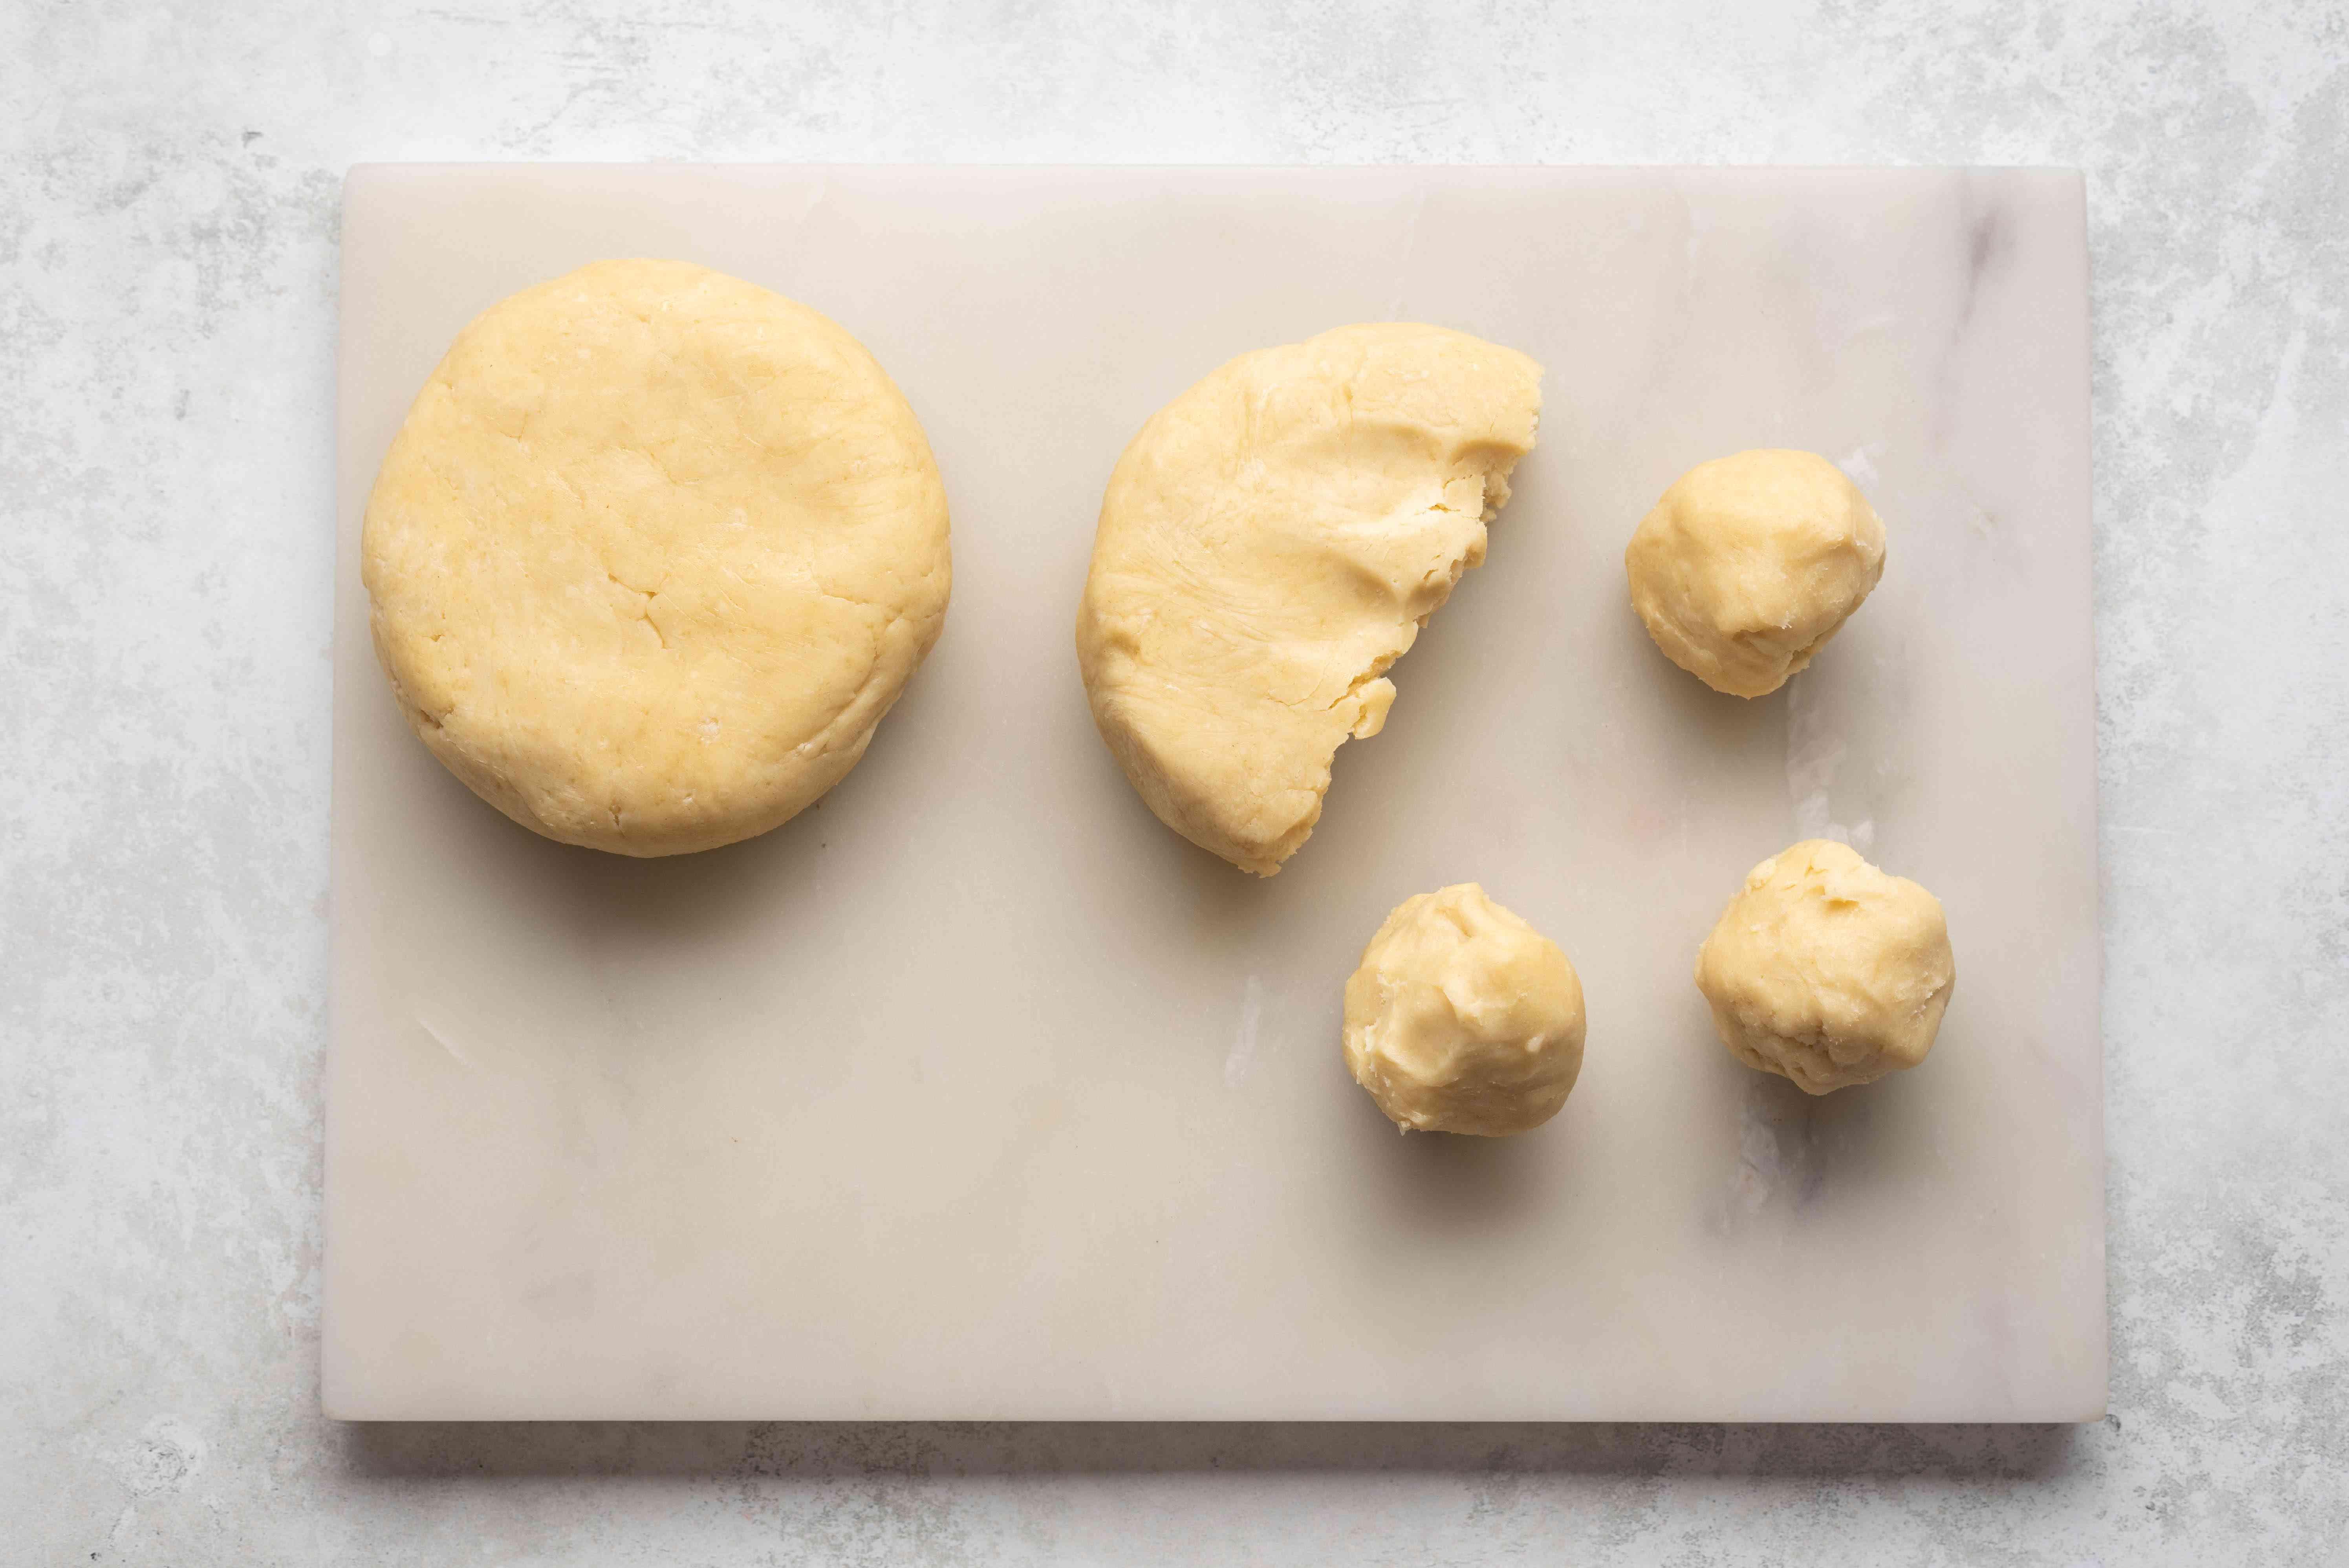 crust dough formed into balls